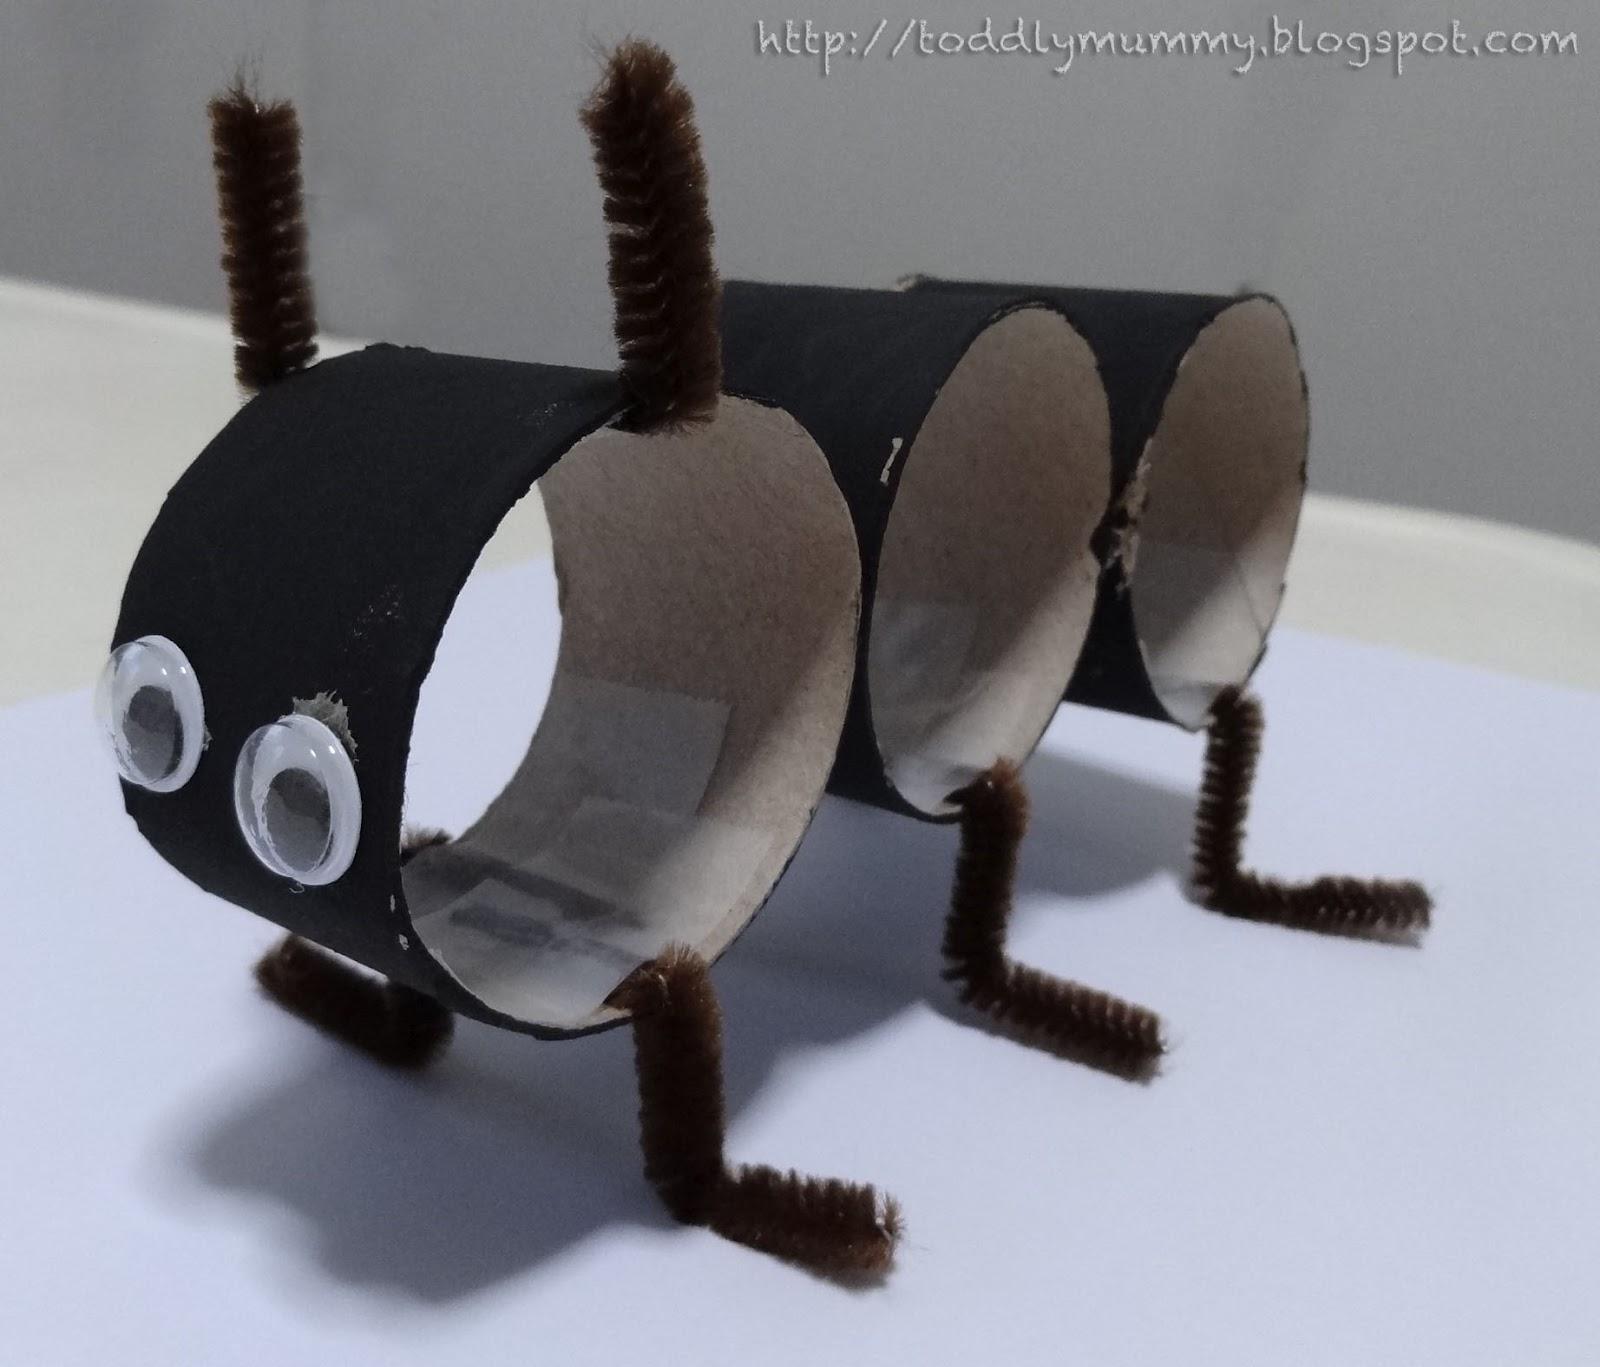 Craft Fun Toilet Paper Roll Ant on Preschool Love